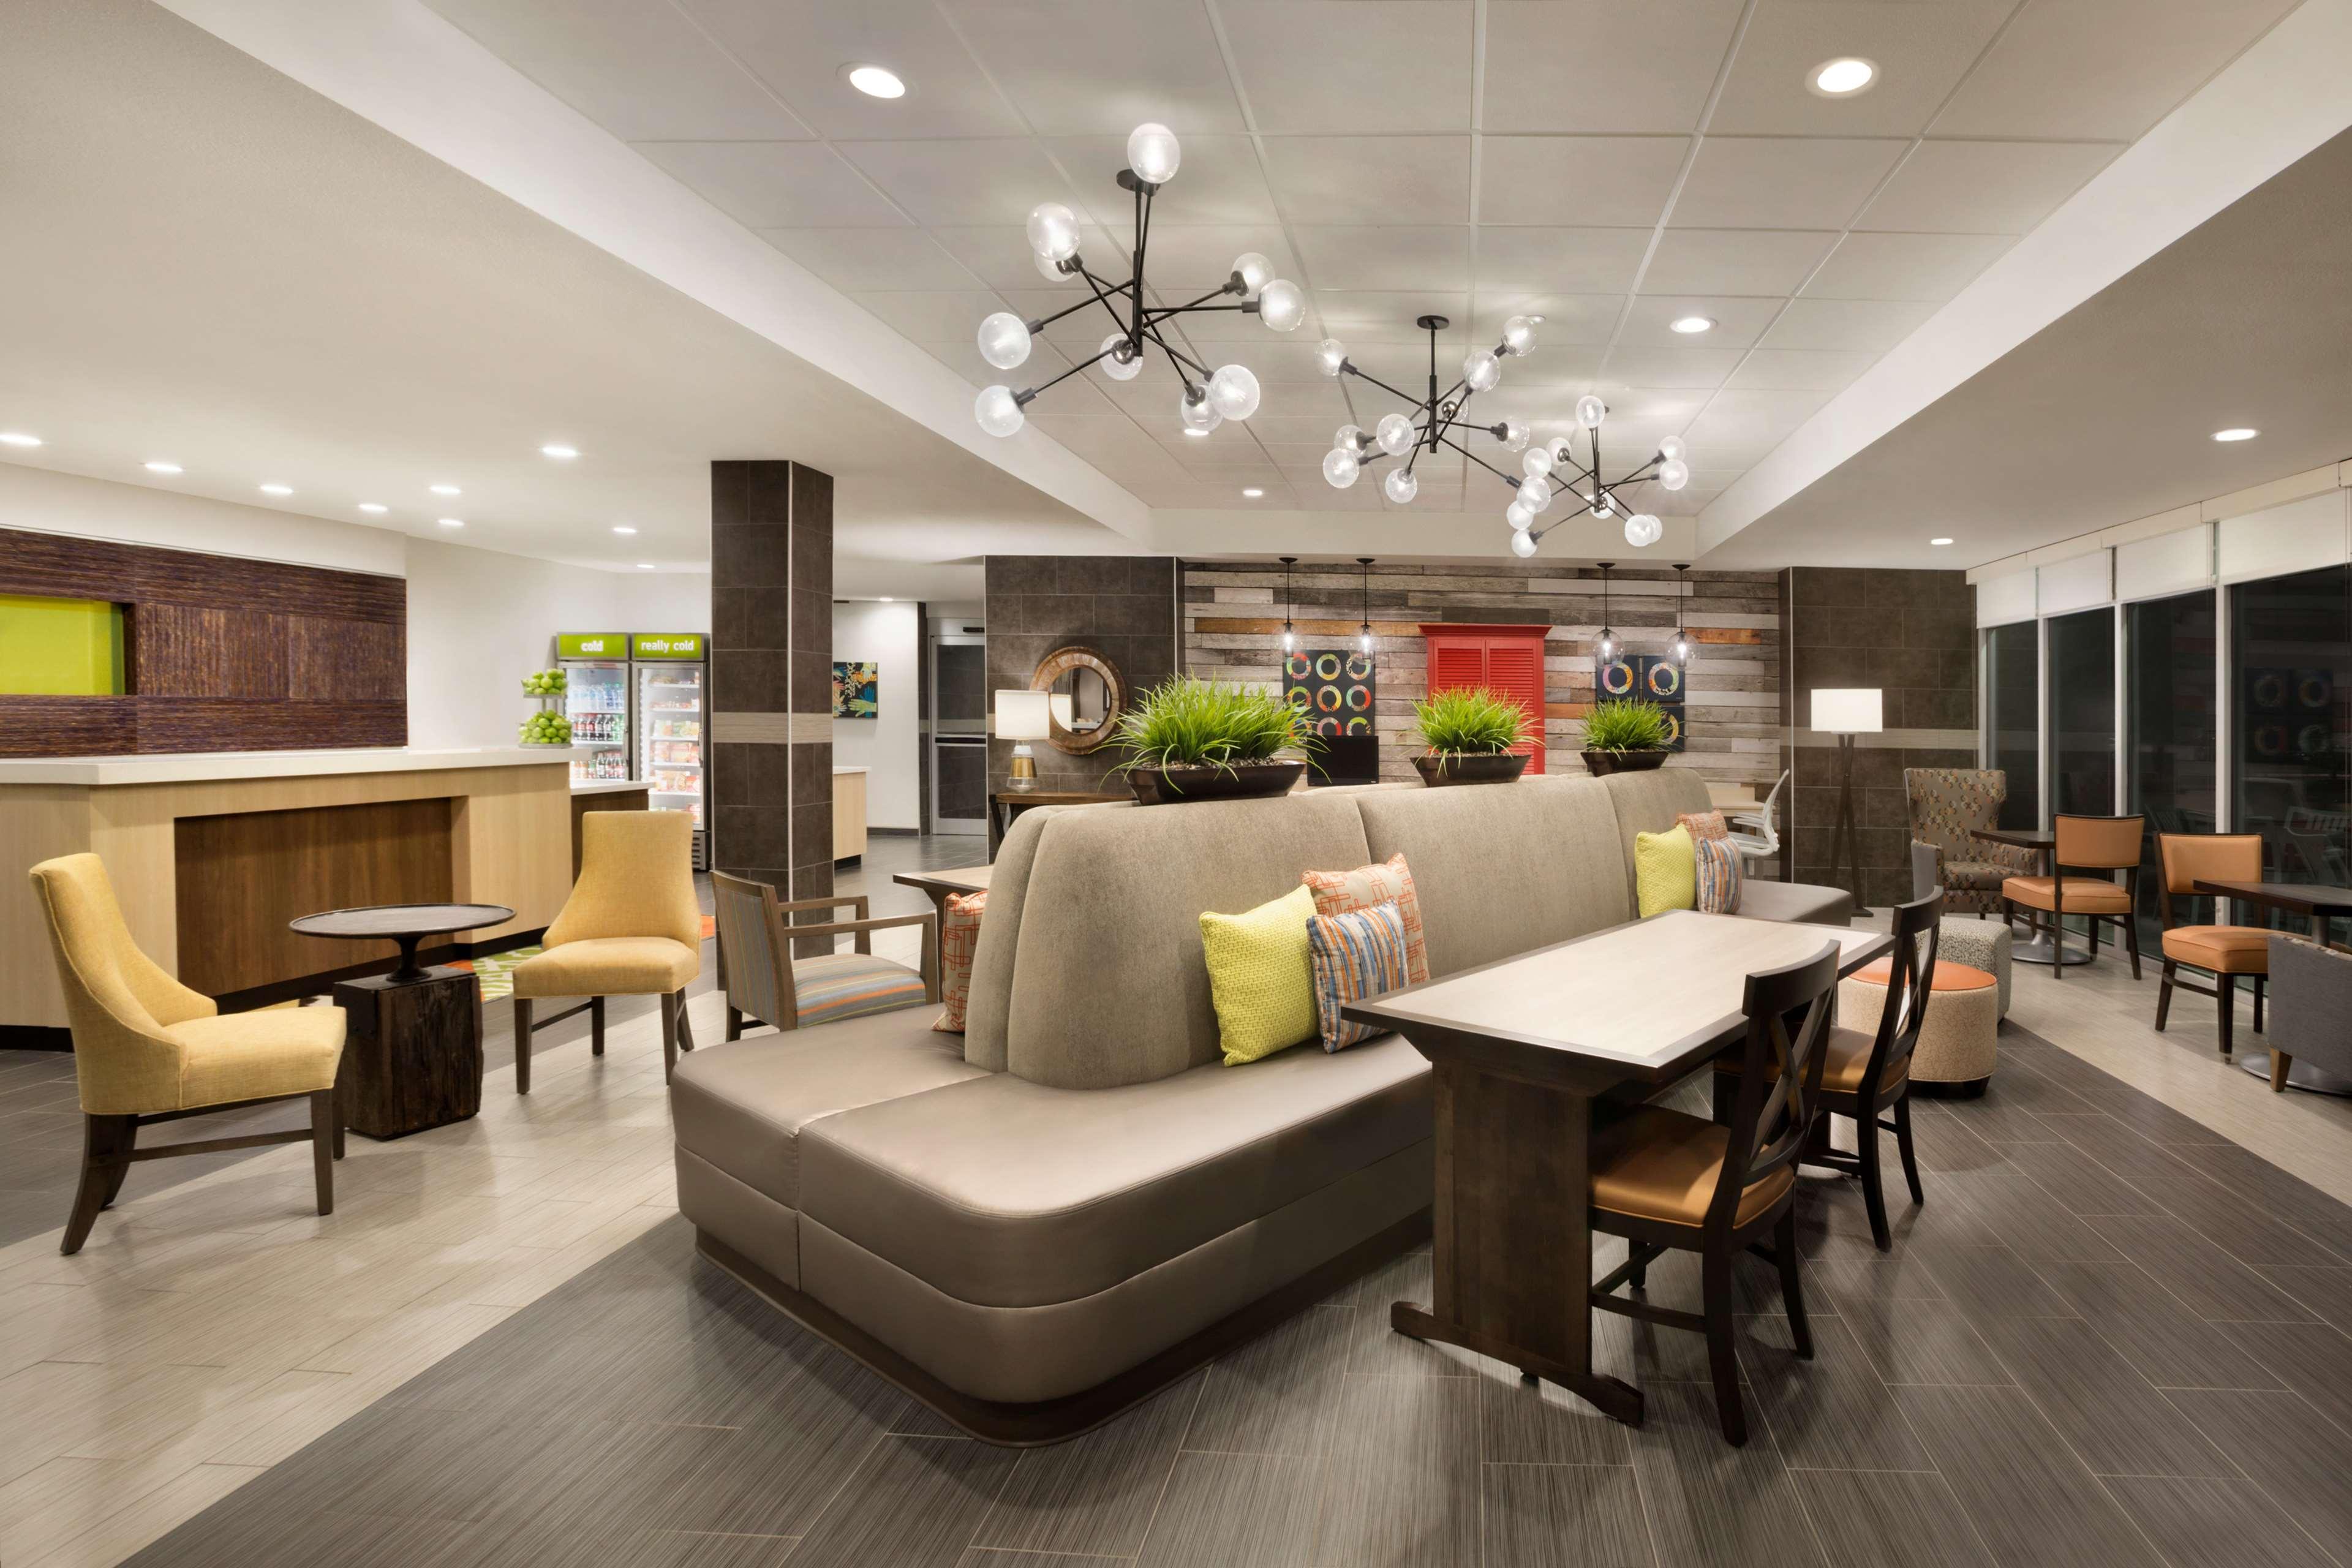 Home2 Suites by Hilton Houston/Webster image 5